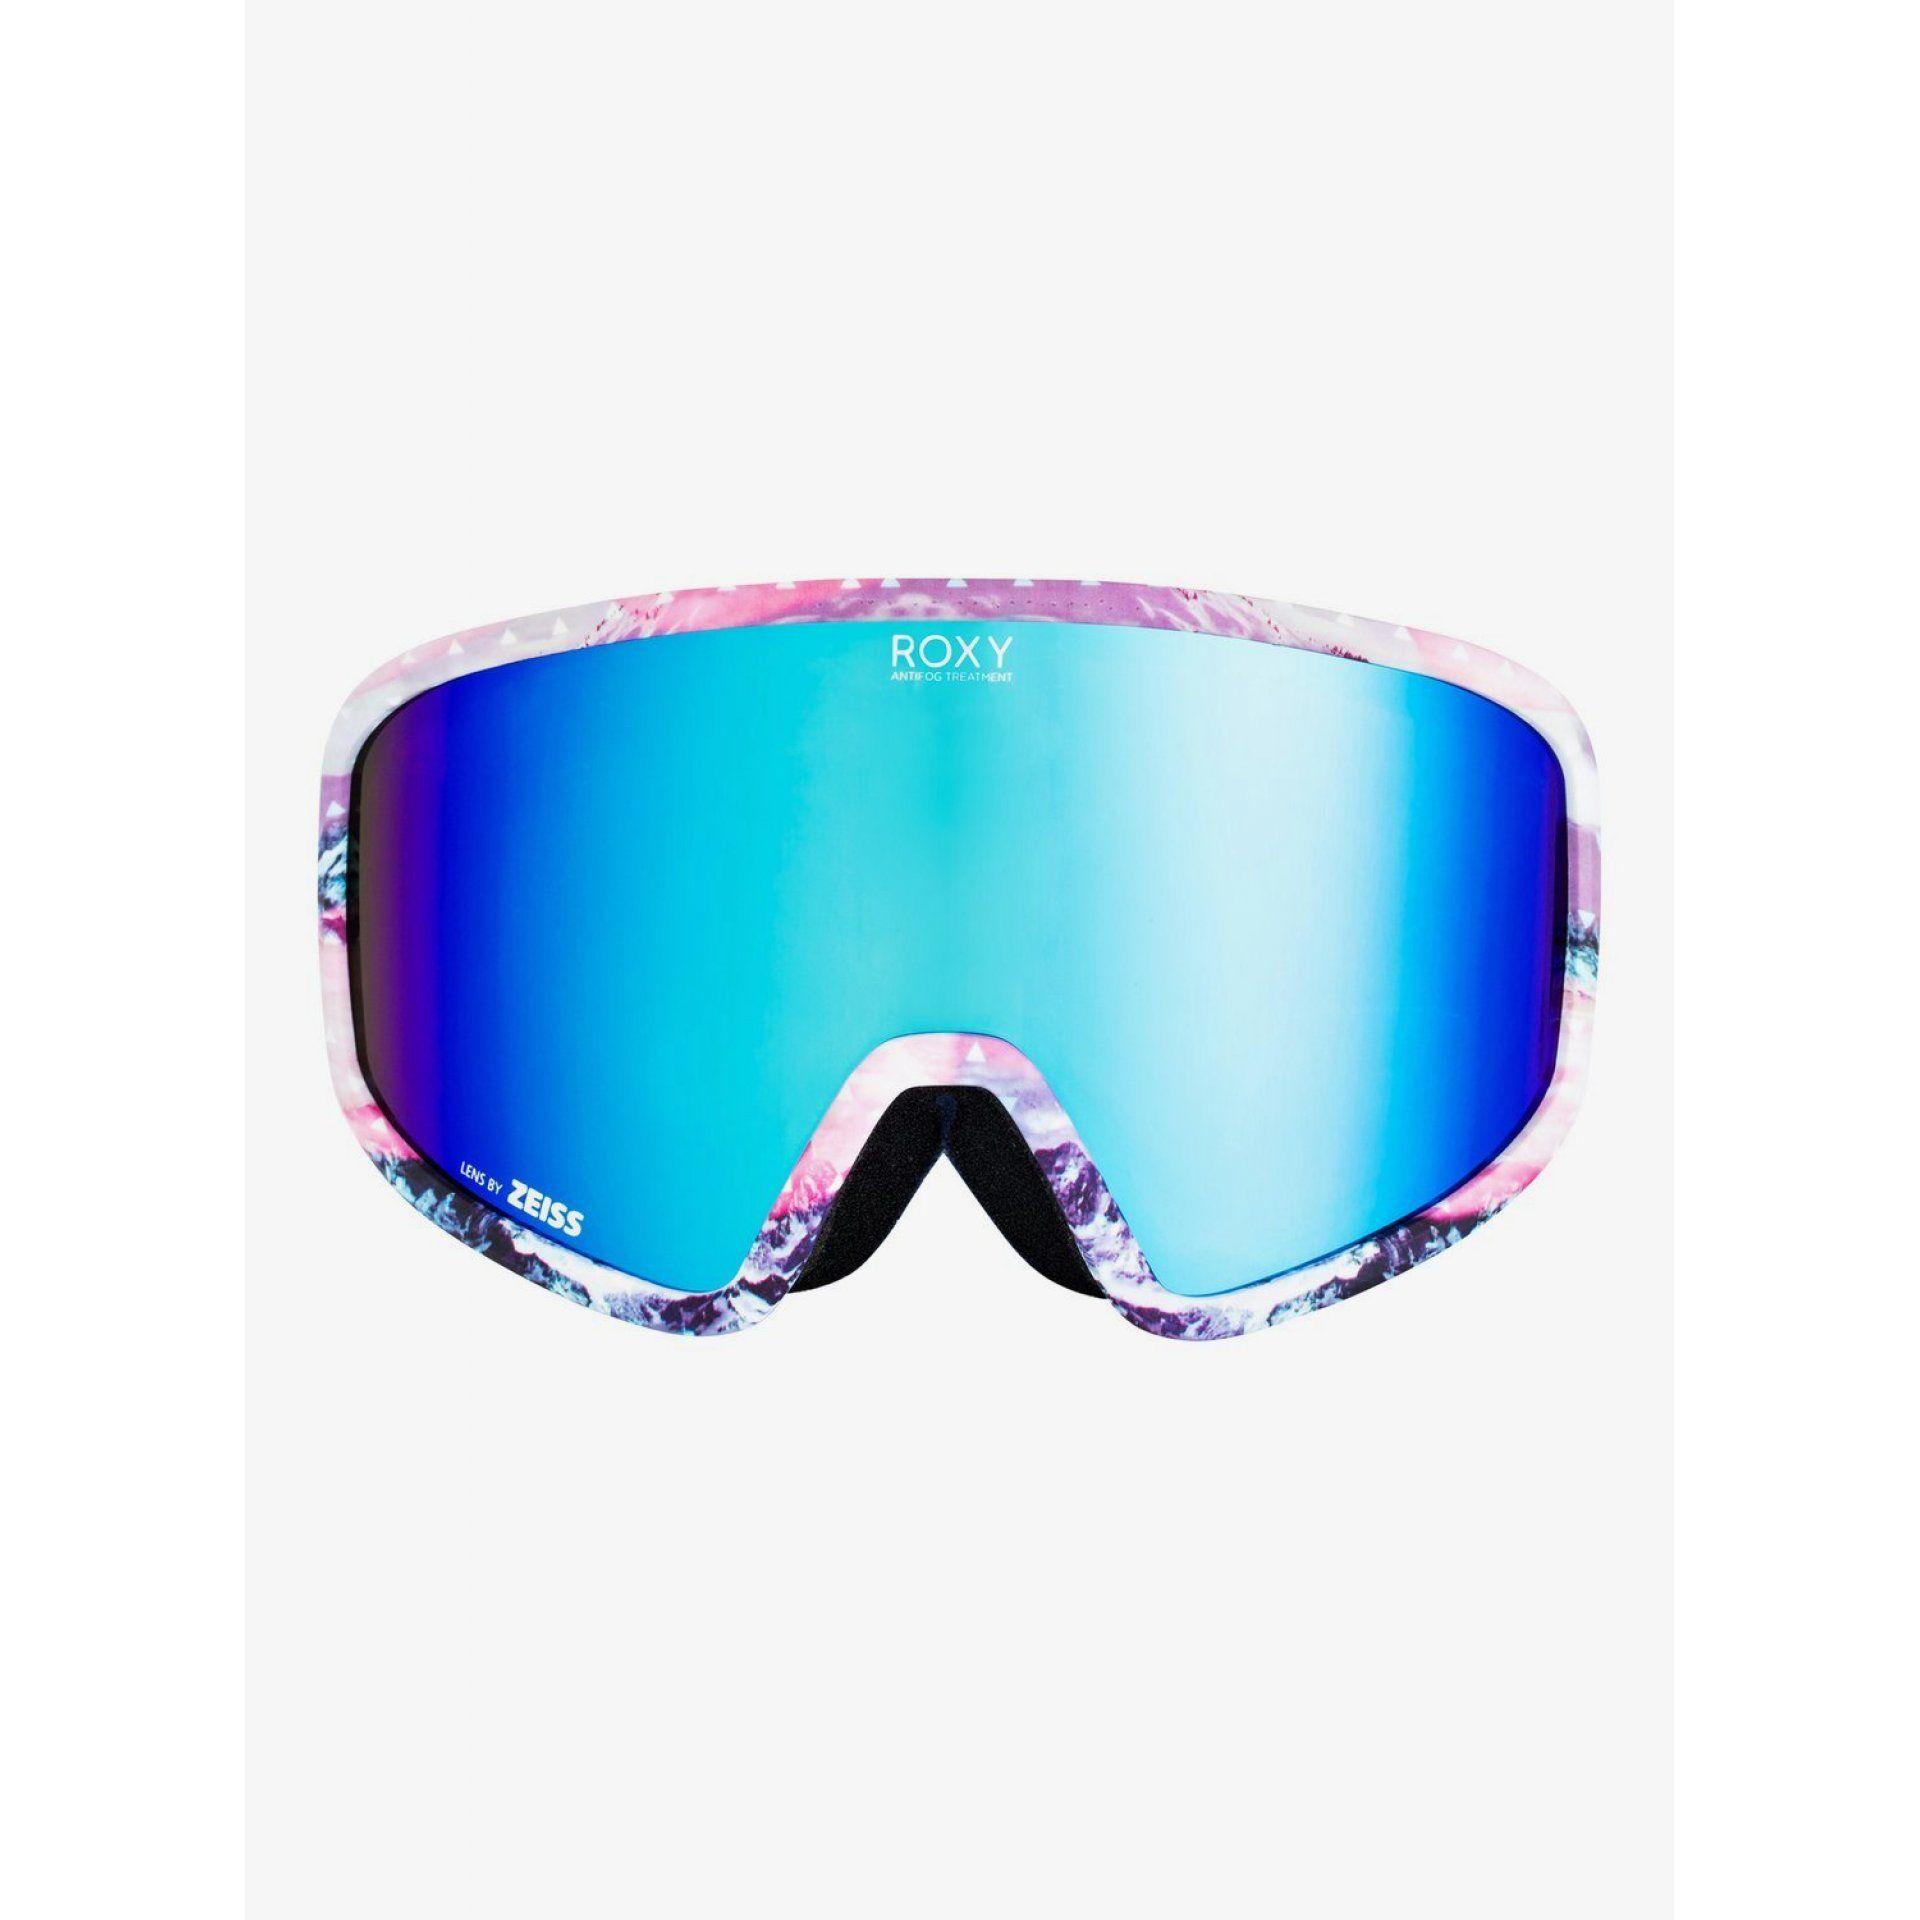 GOGLE ROXY FEENITY 2021 ERJTG03130 BRIGHT WHITE PYRENNES SONAR ML BLUE WBB4 PRZÓD